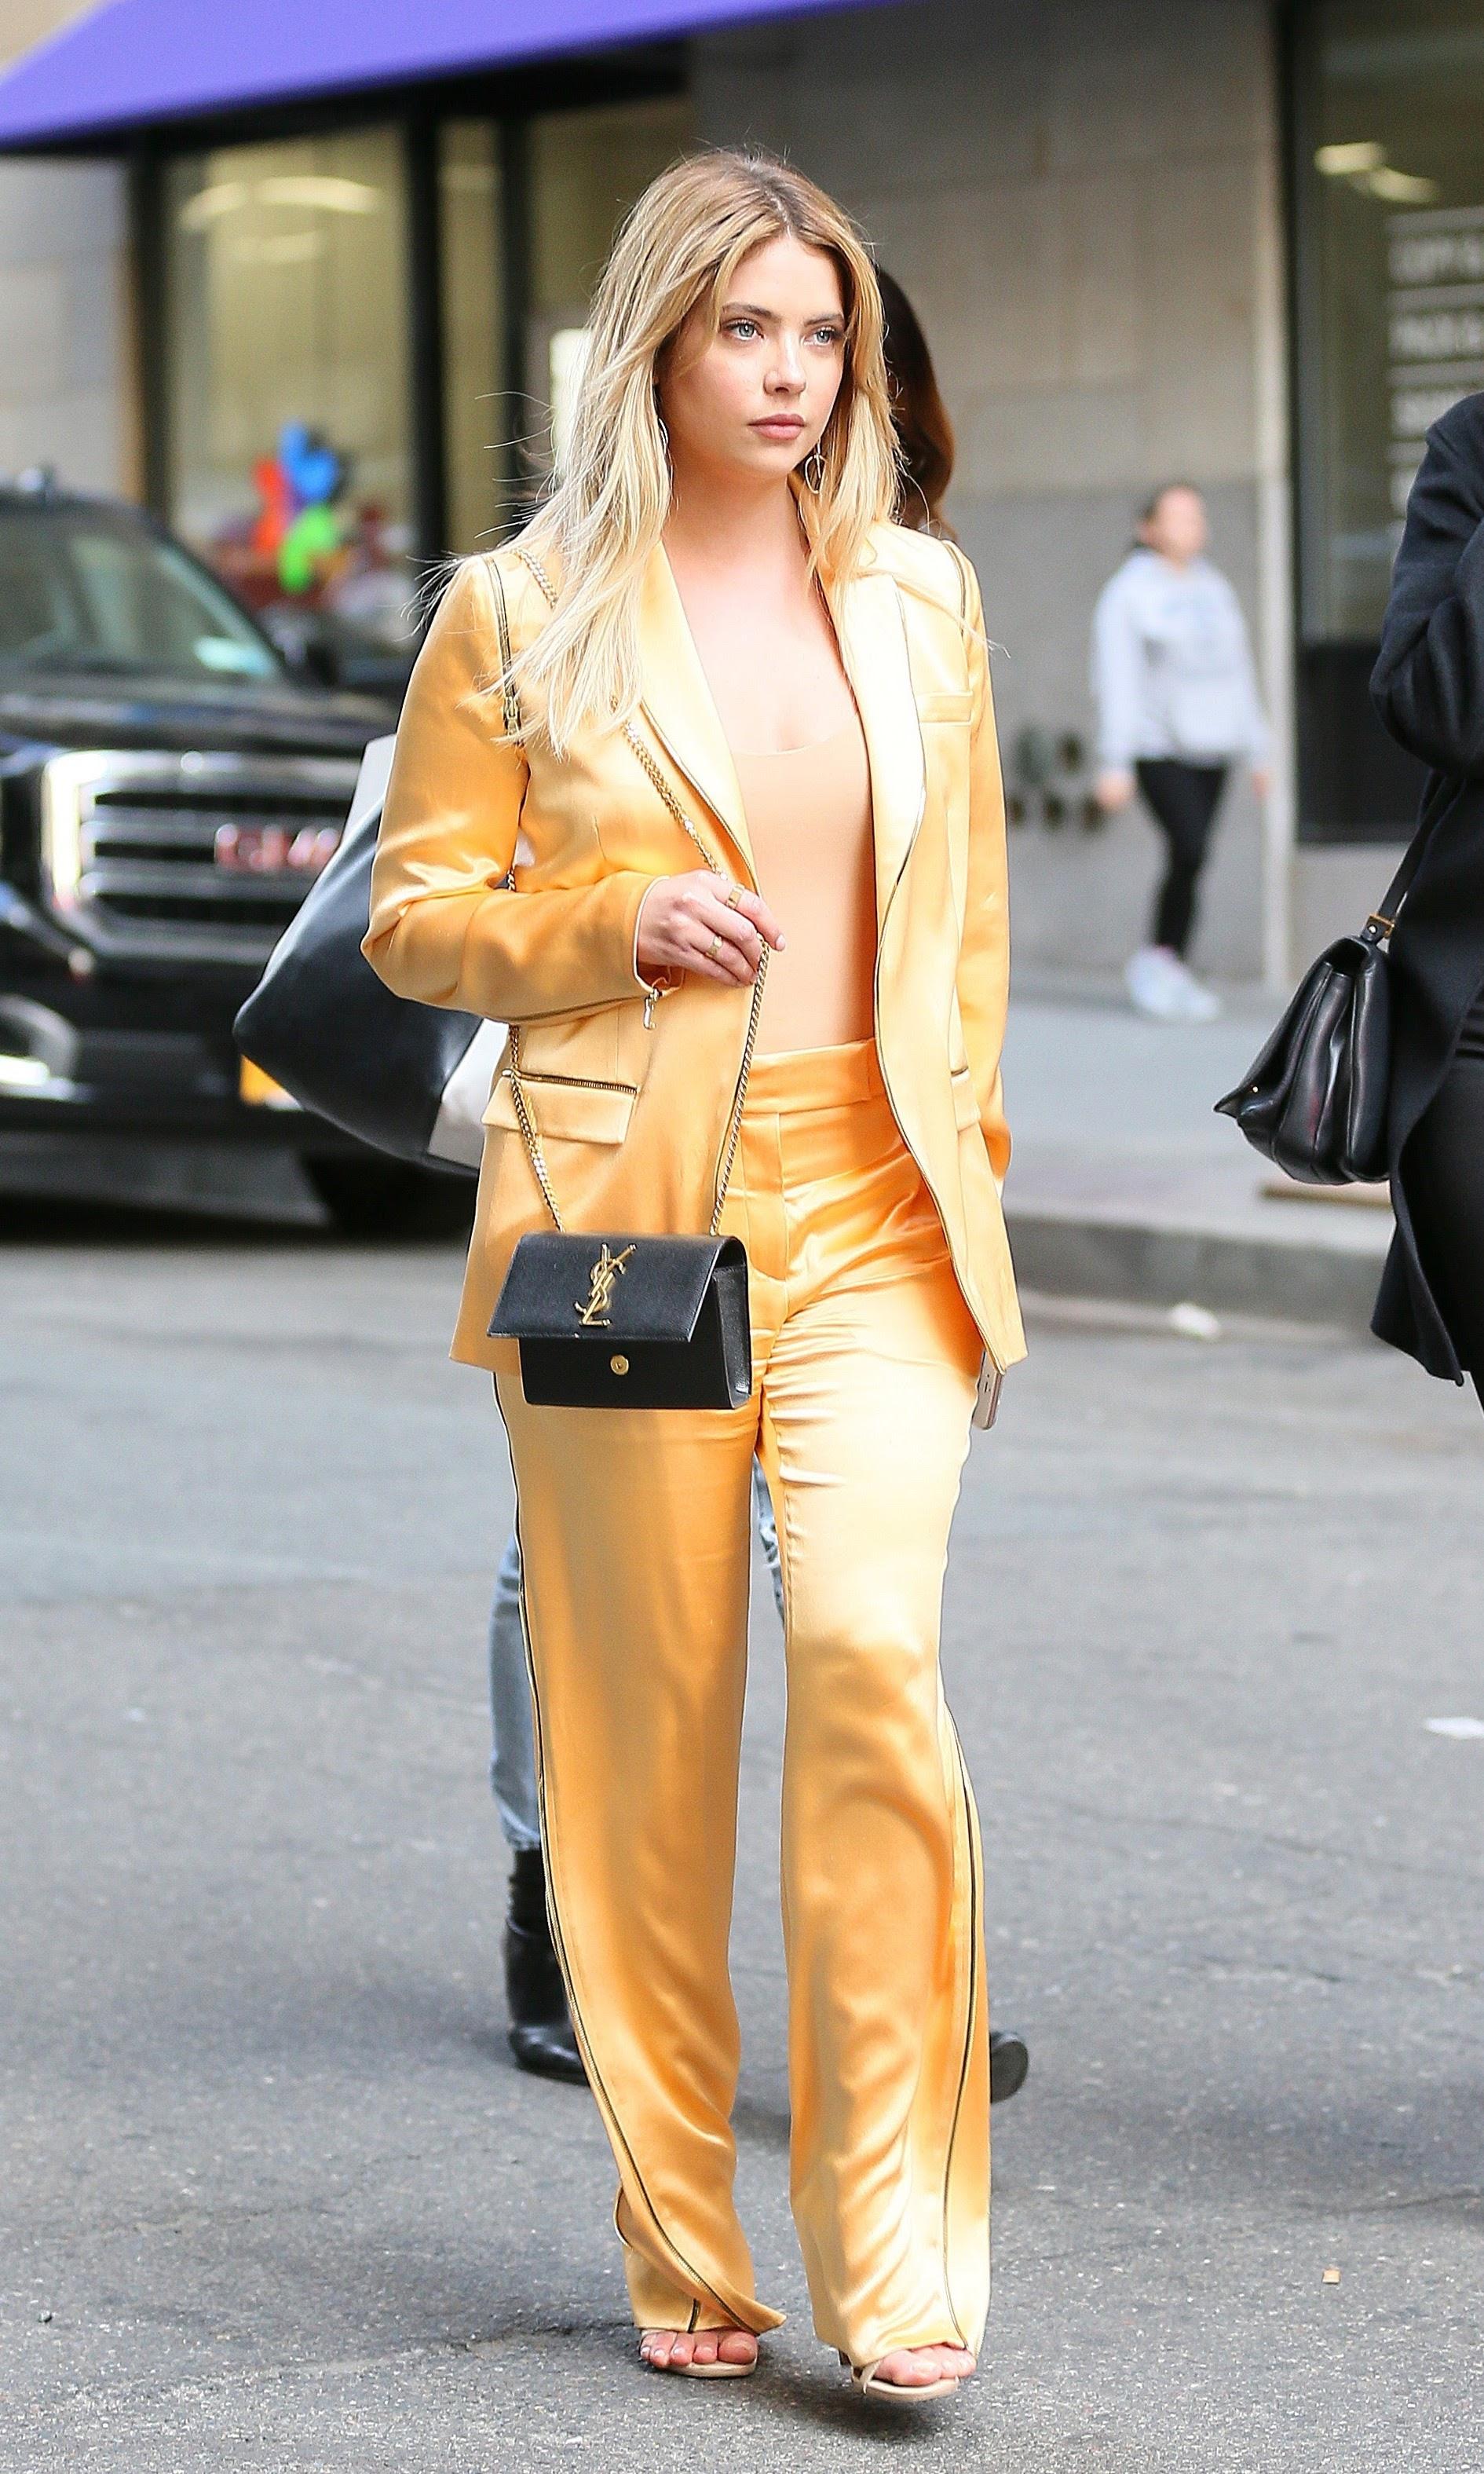 Ashley_Benson-wearing sophie theallet-Facebook-NY-Apr_17_2017-005.jpg